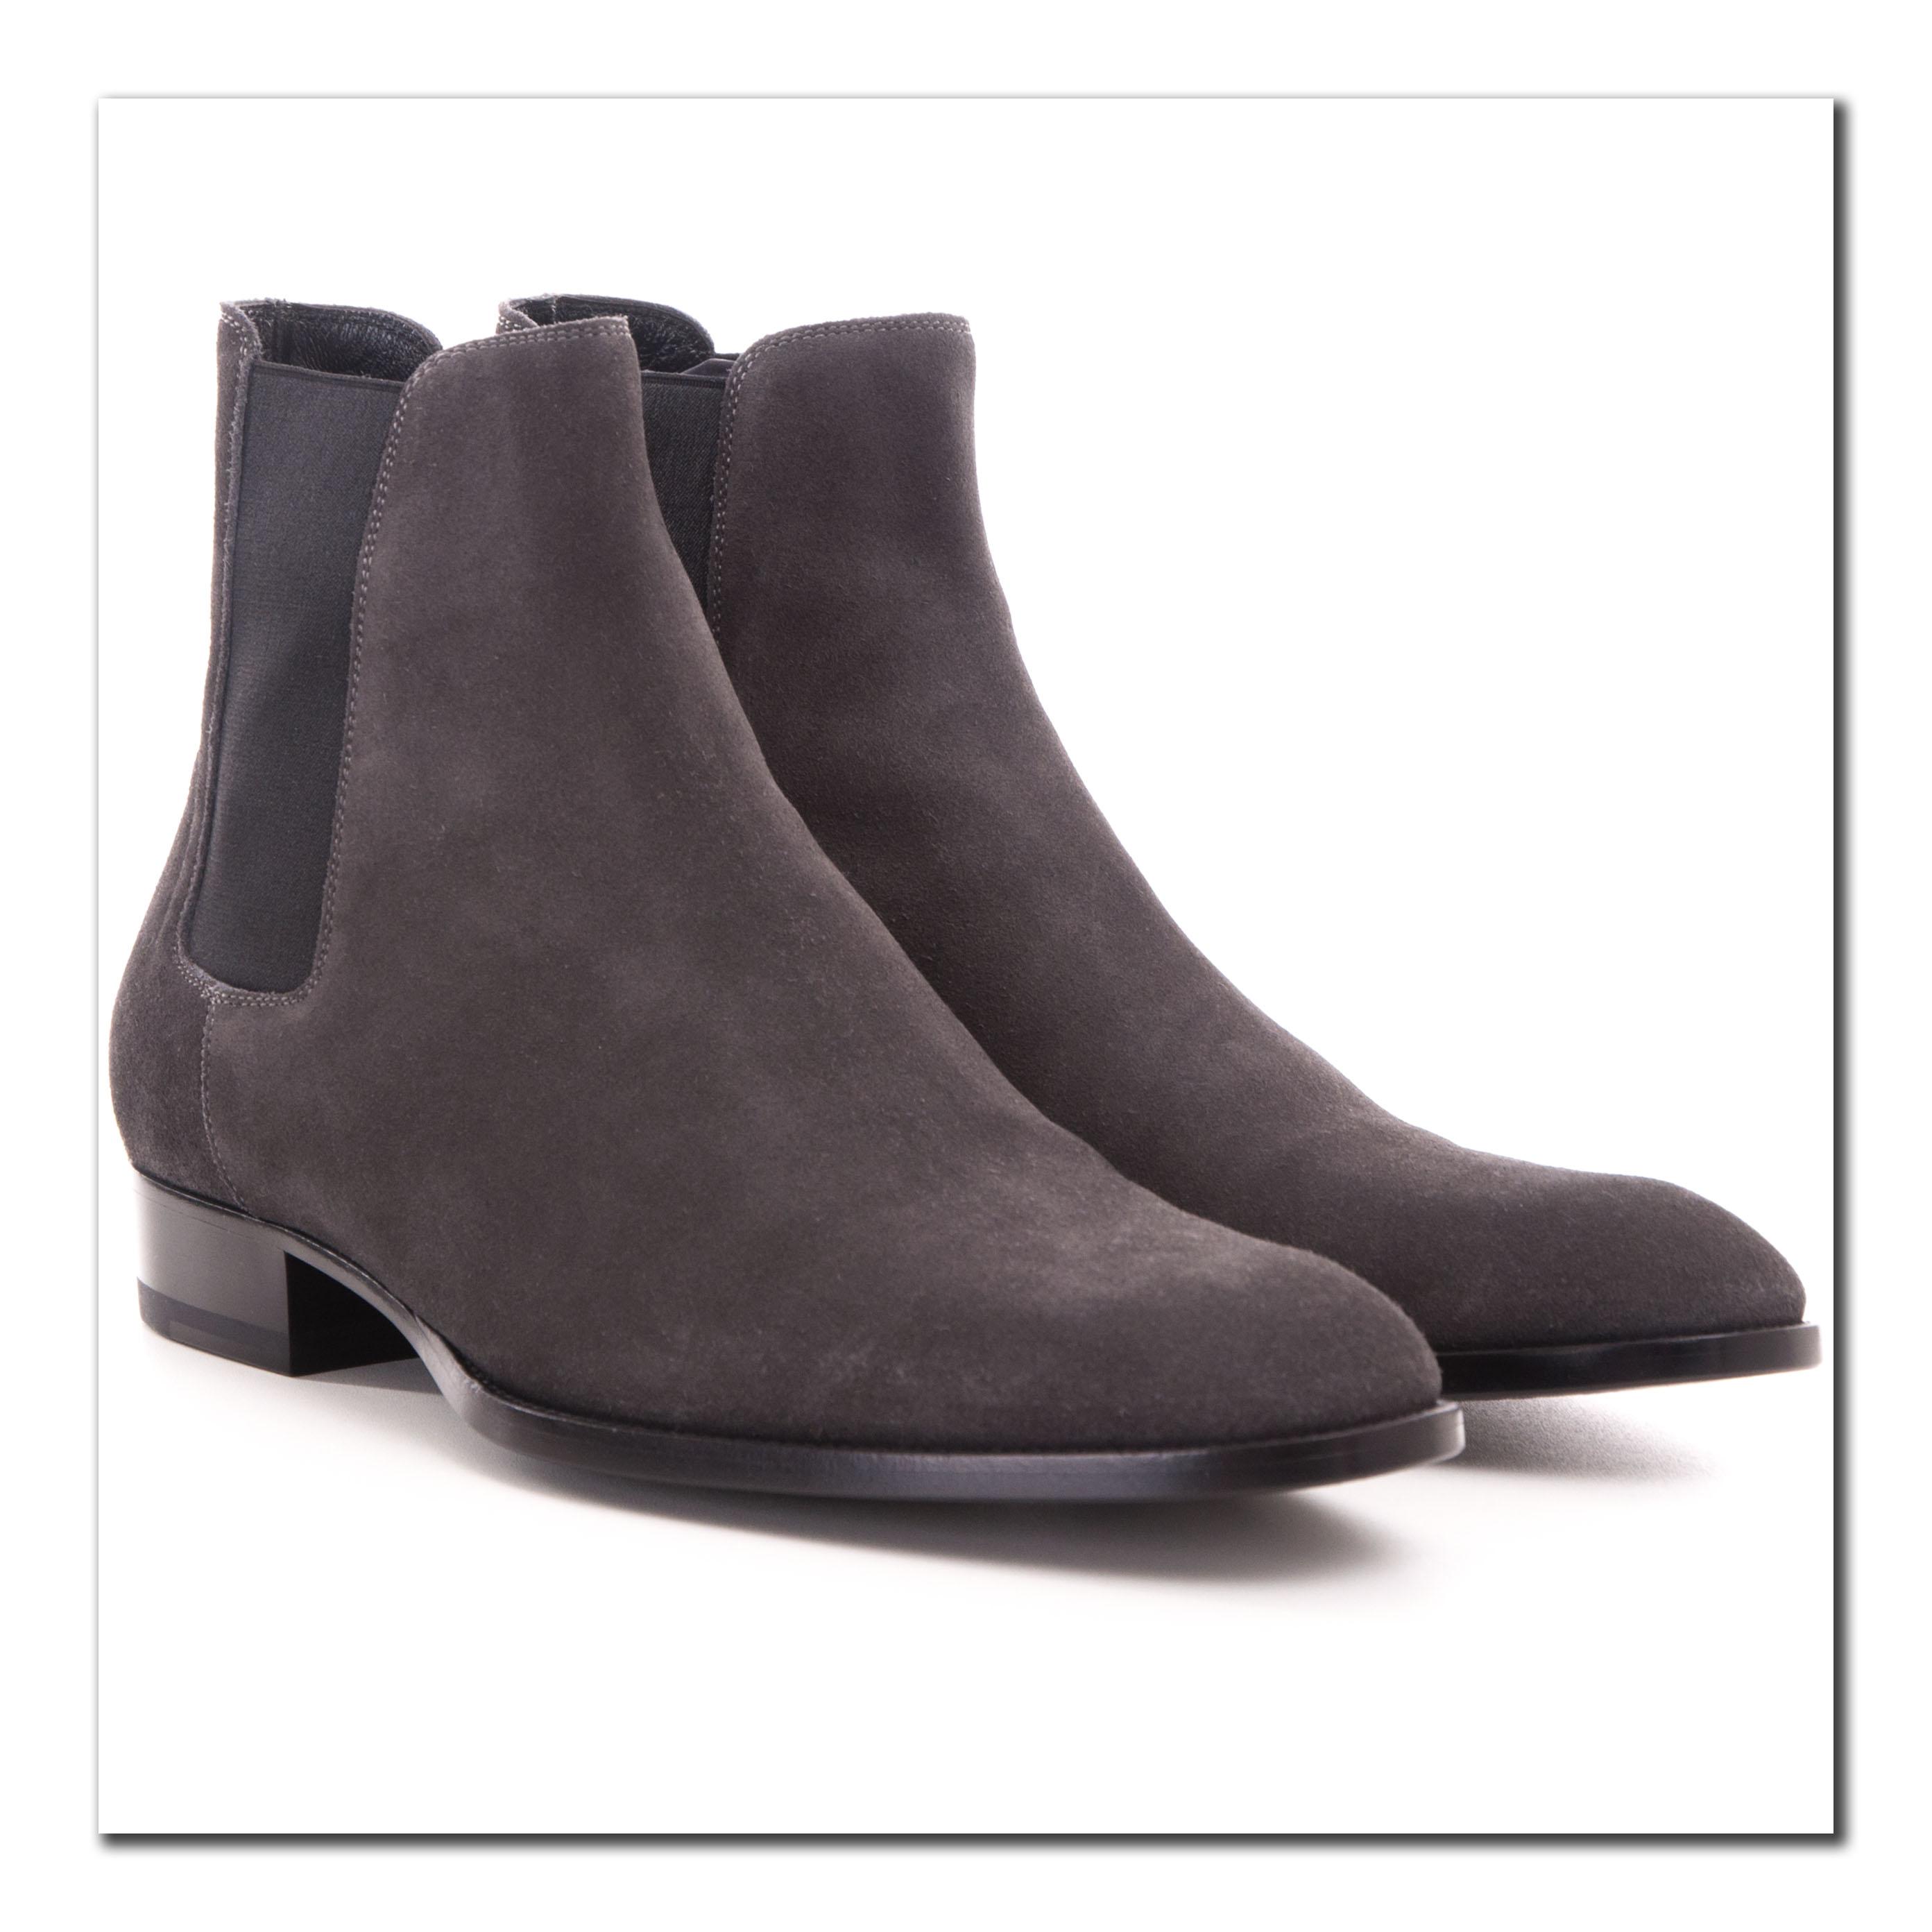 b40ff86f65c Saint Laurent Paris 945$ New Wyatt 30 Chelsea Boots In Asphalt Suede ...